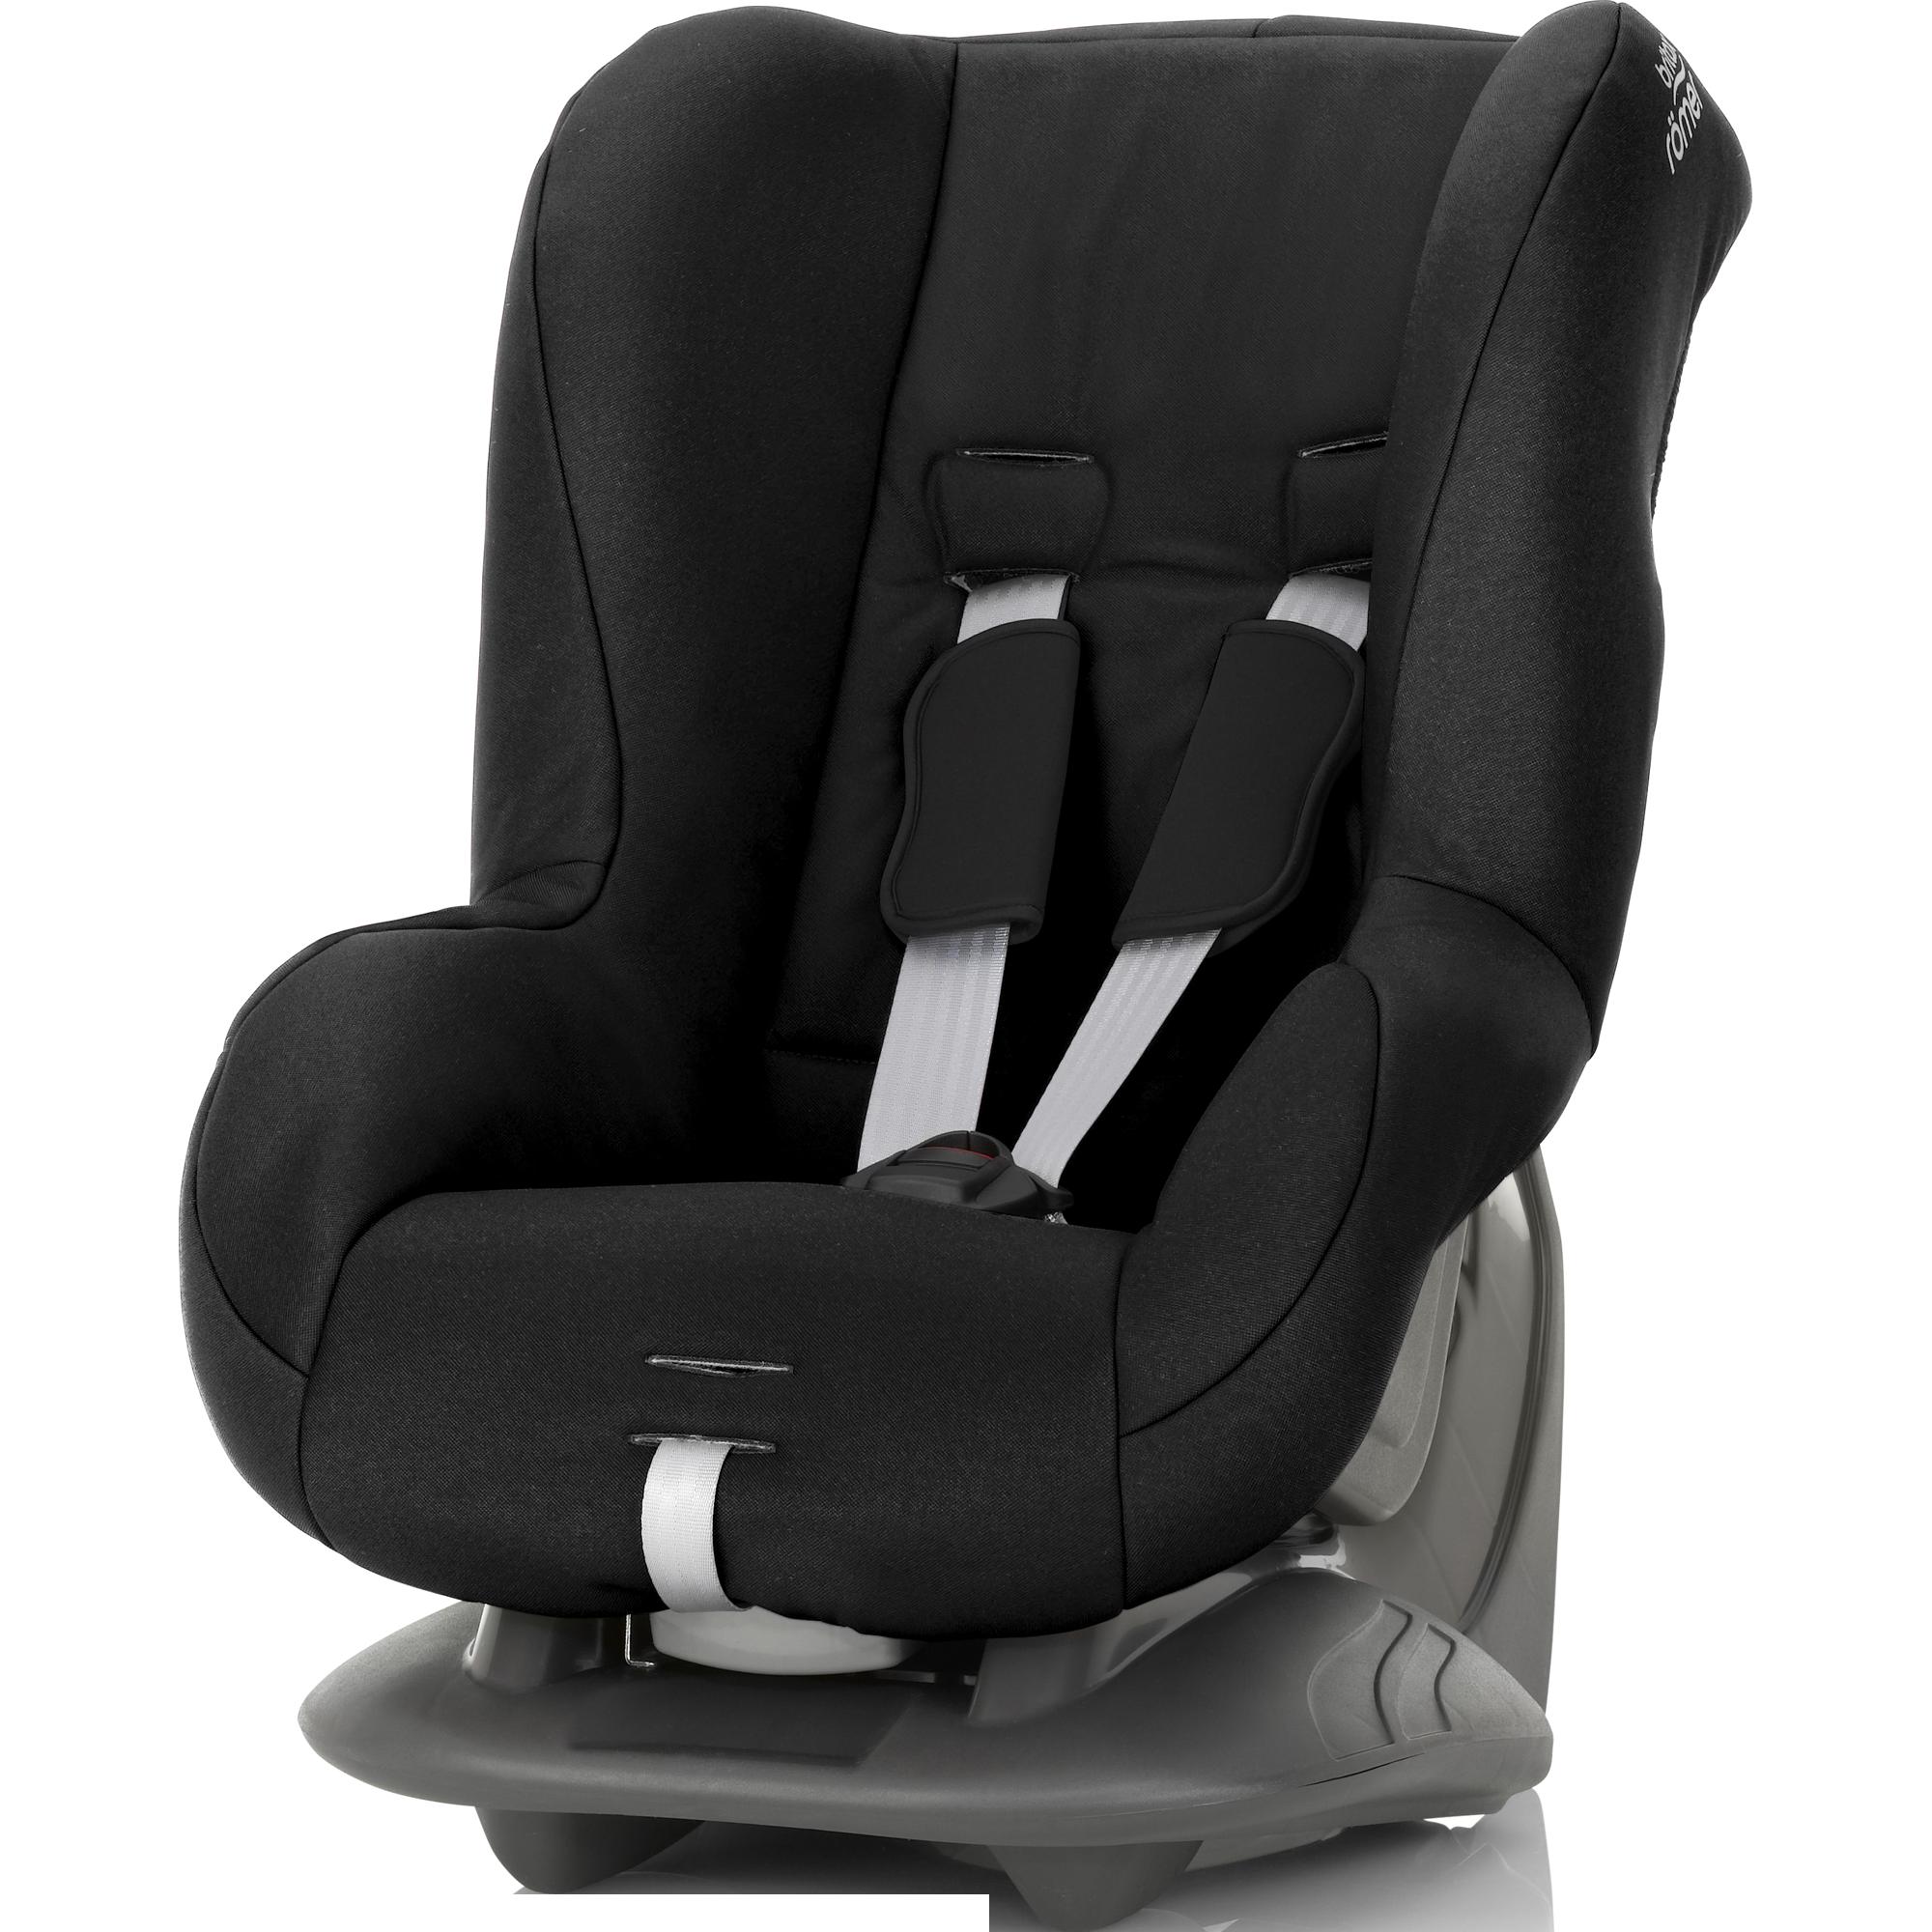 Britax Eclipse Forward Facing Car Seat, Group 1 - Black ...